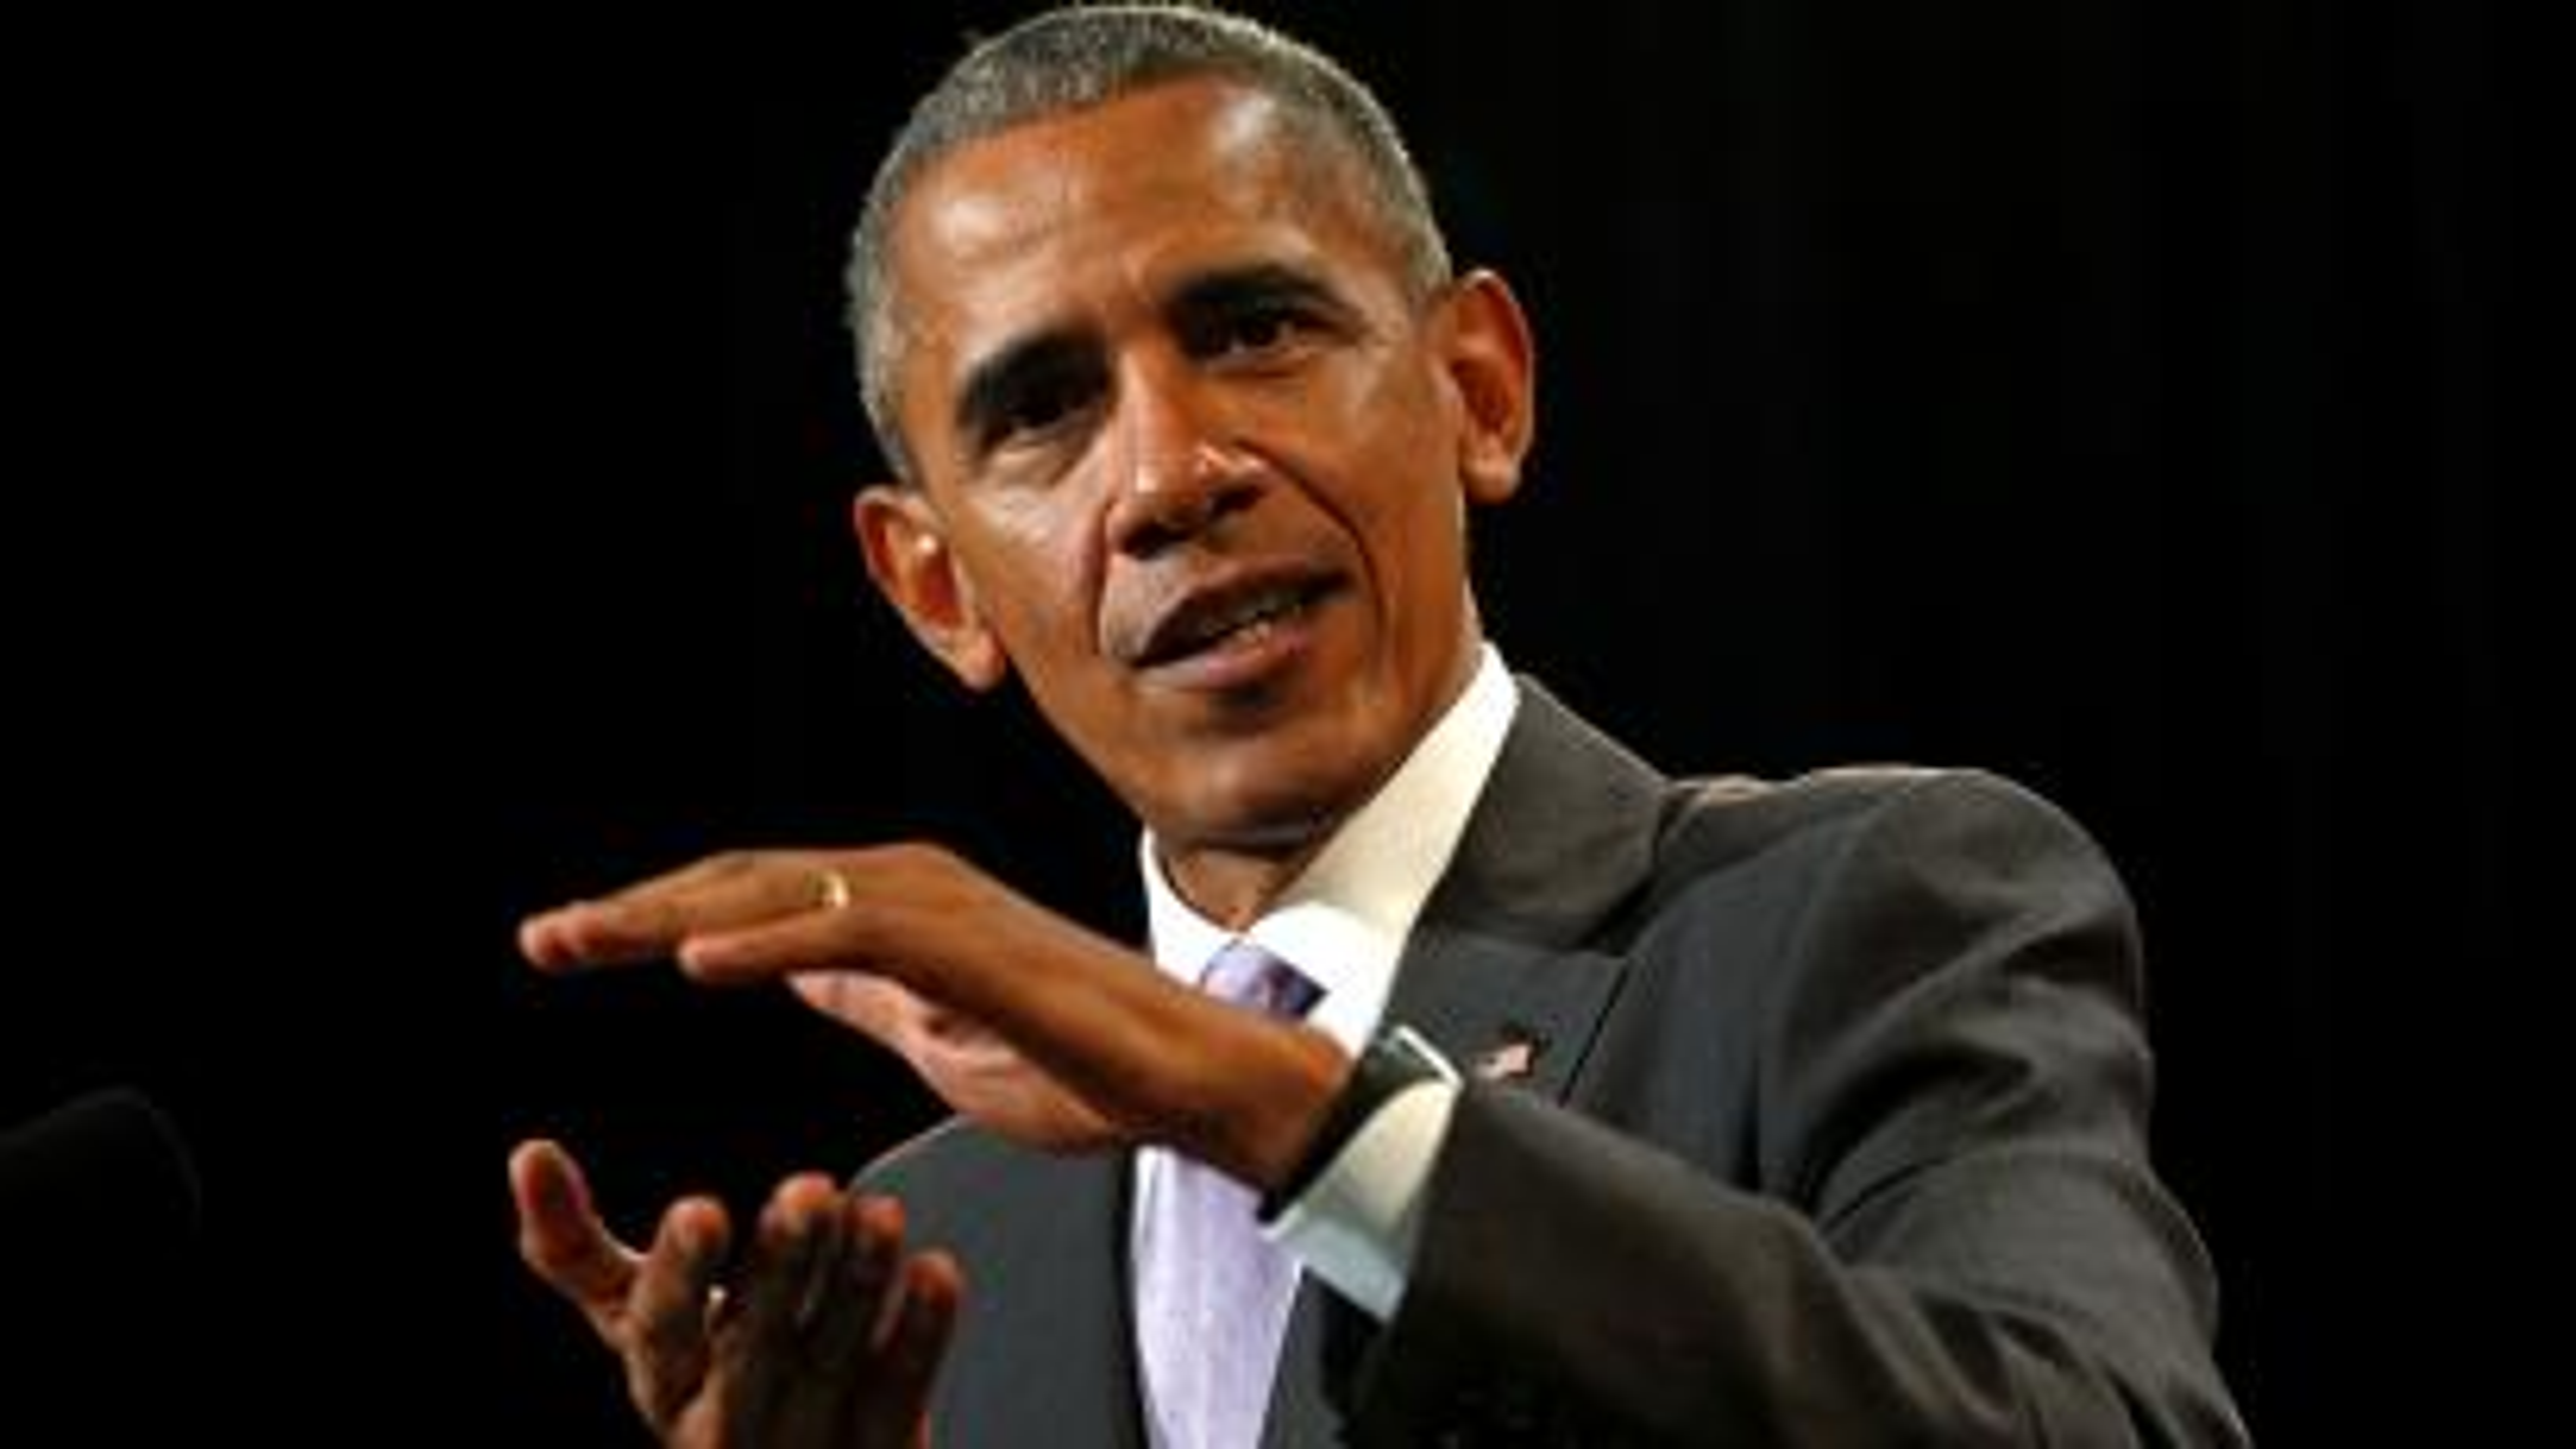 Barack Obama TPP